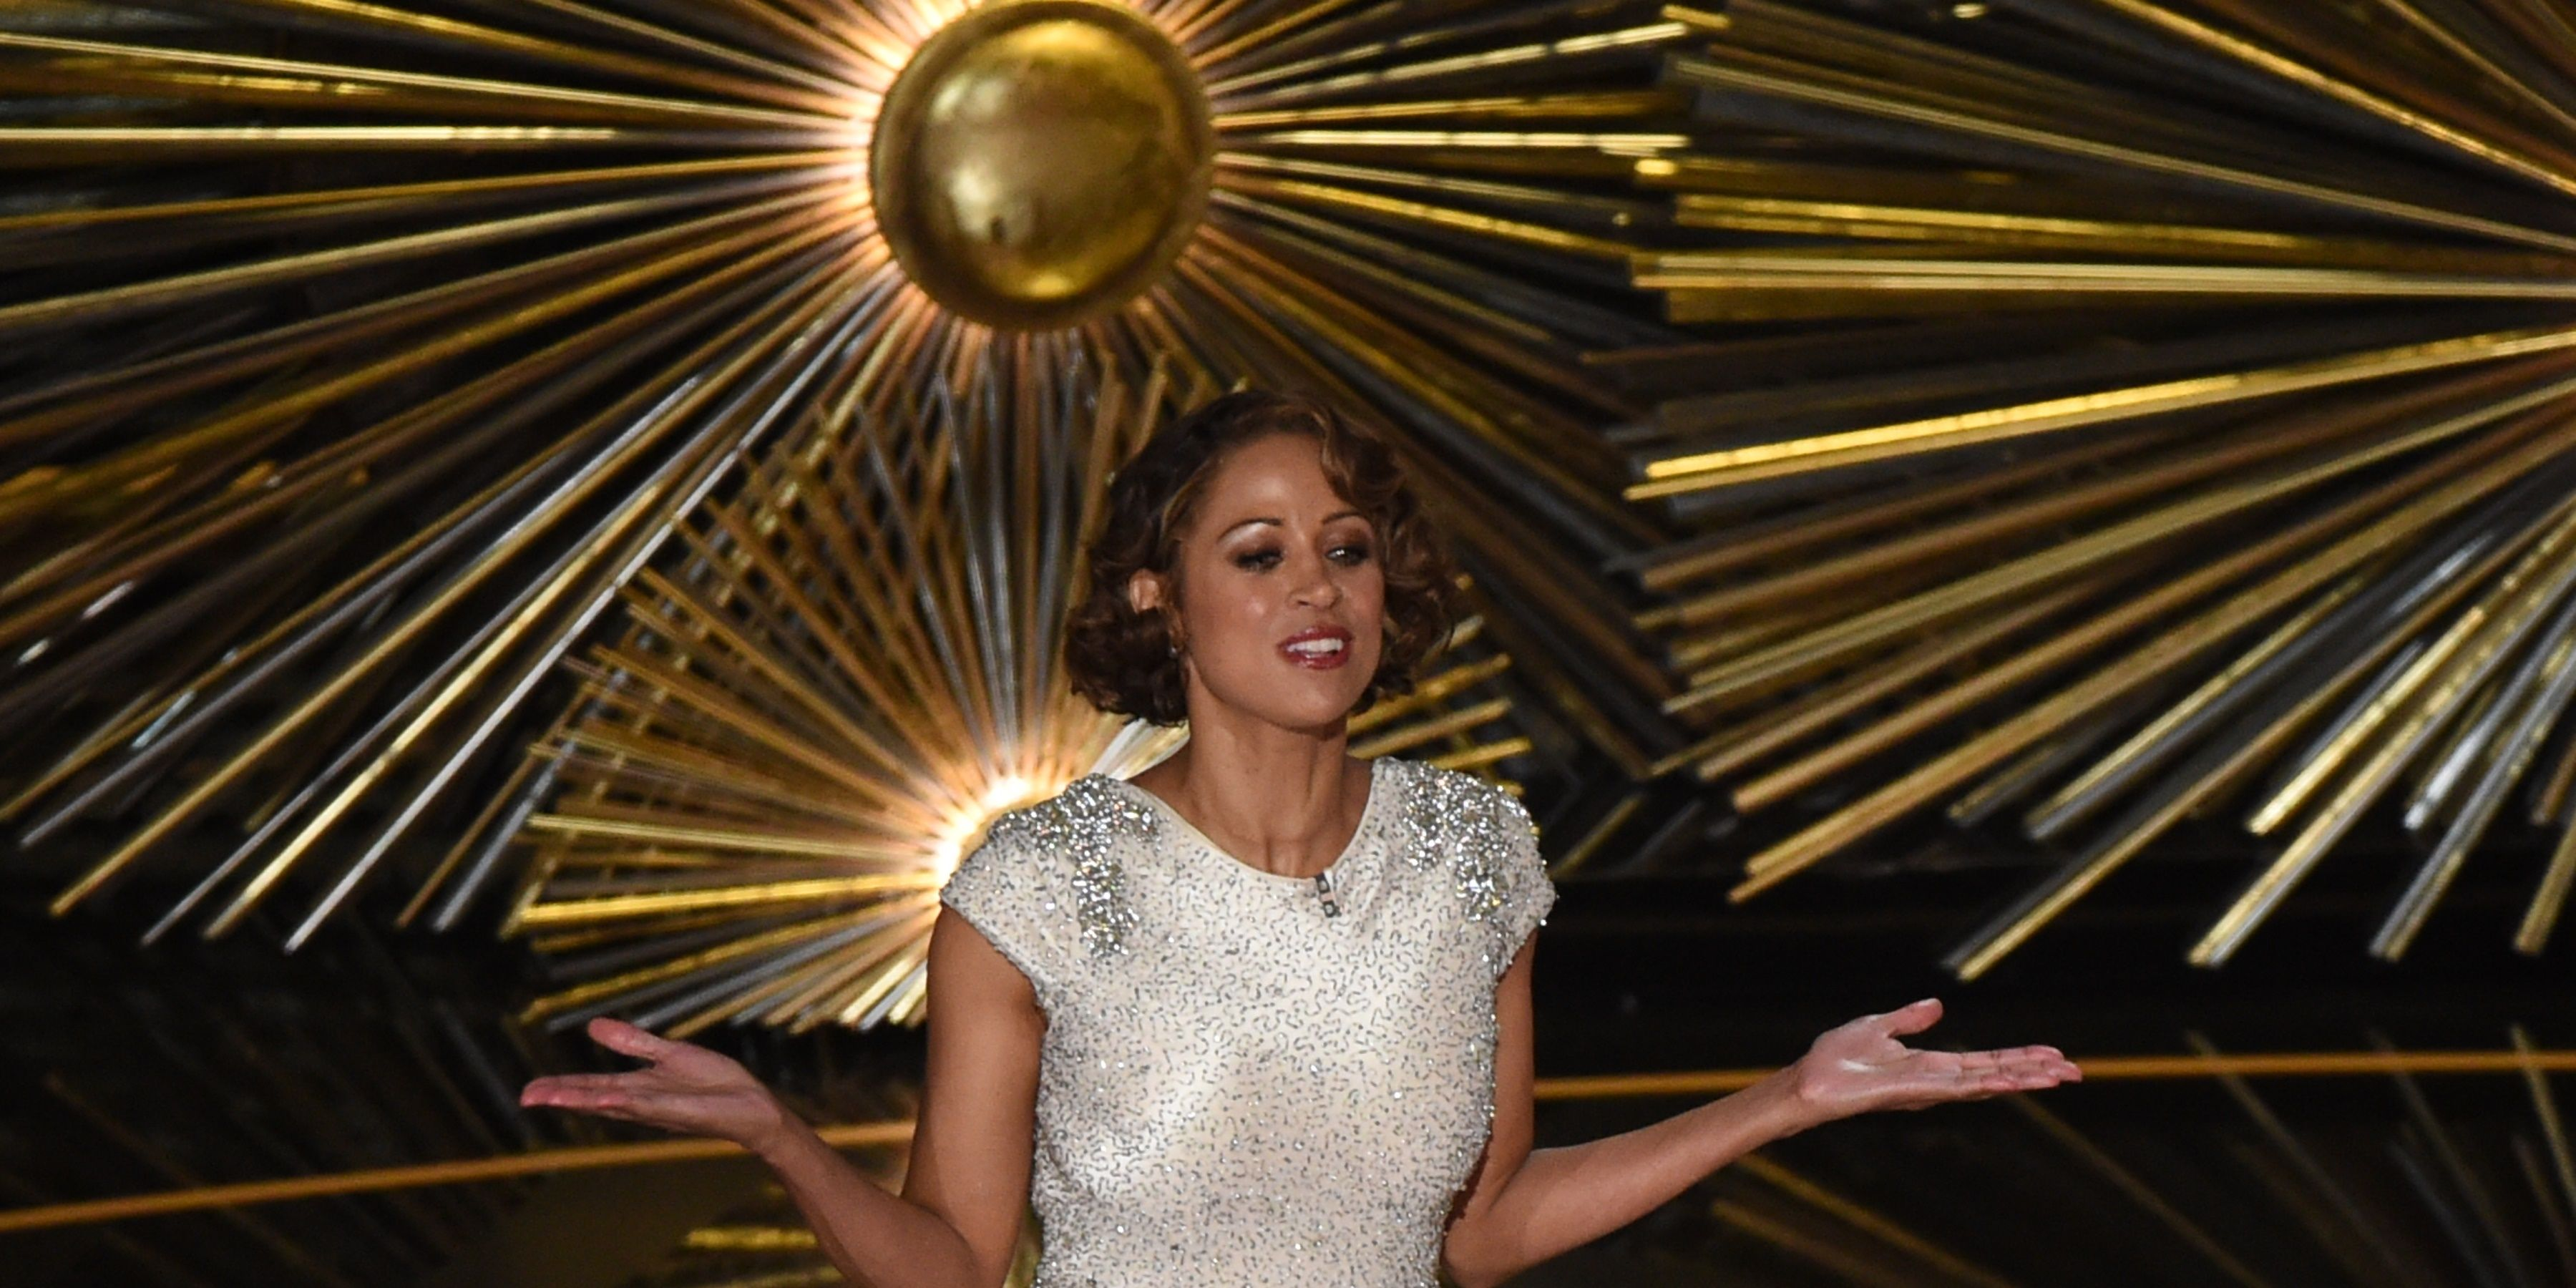 Stacey Dash Oscars cameo